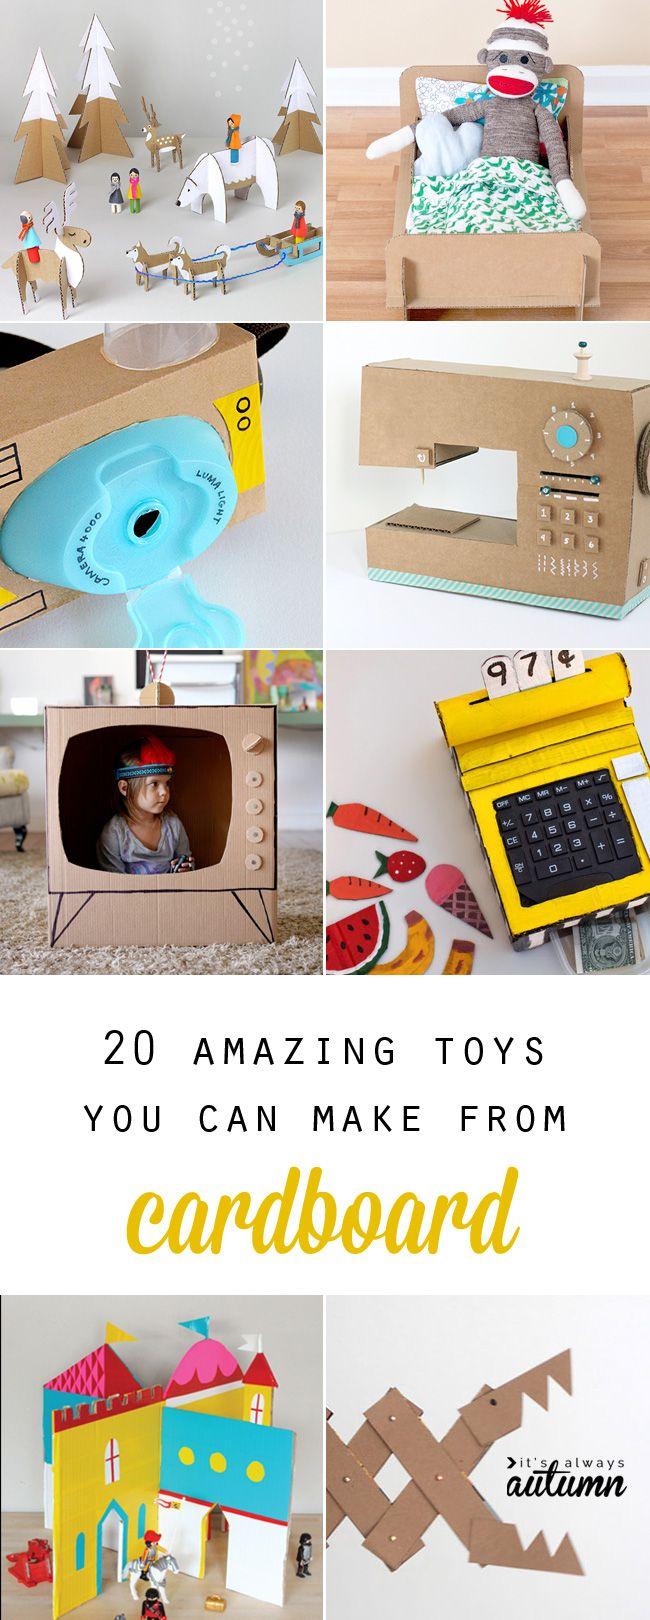 Craft toys for kids - 20 Coolest Toys You Can Make From Cardboard Cardboard Crafts Kidscardboard